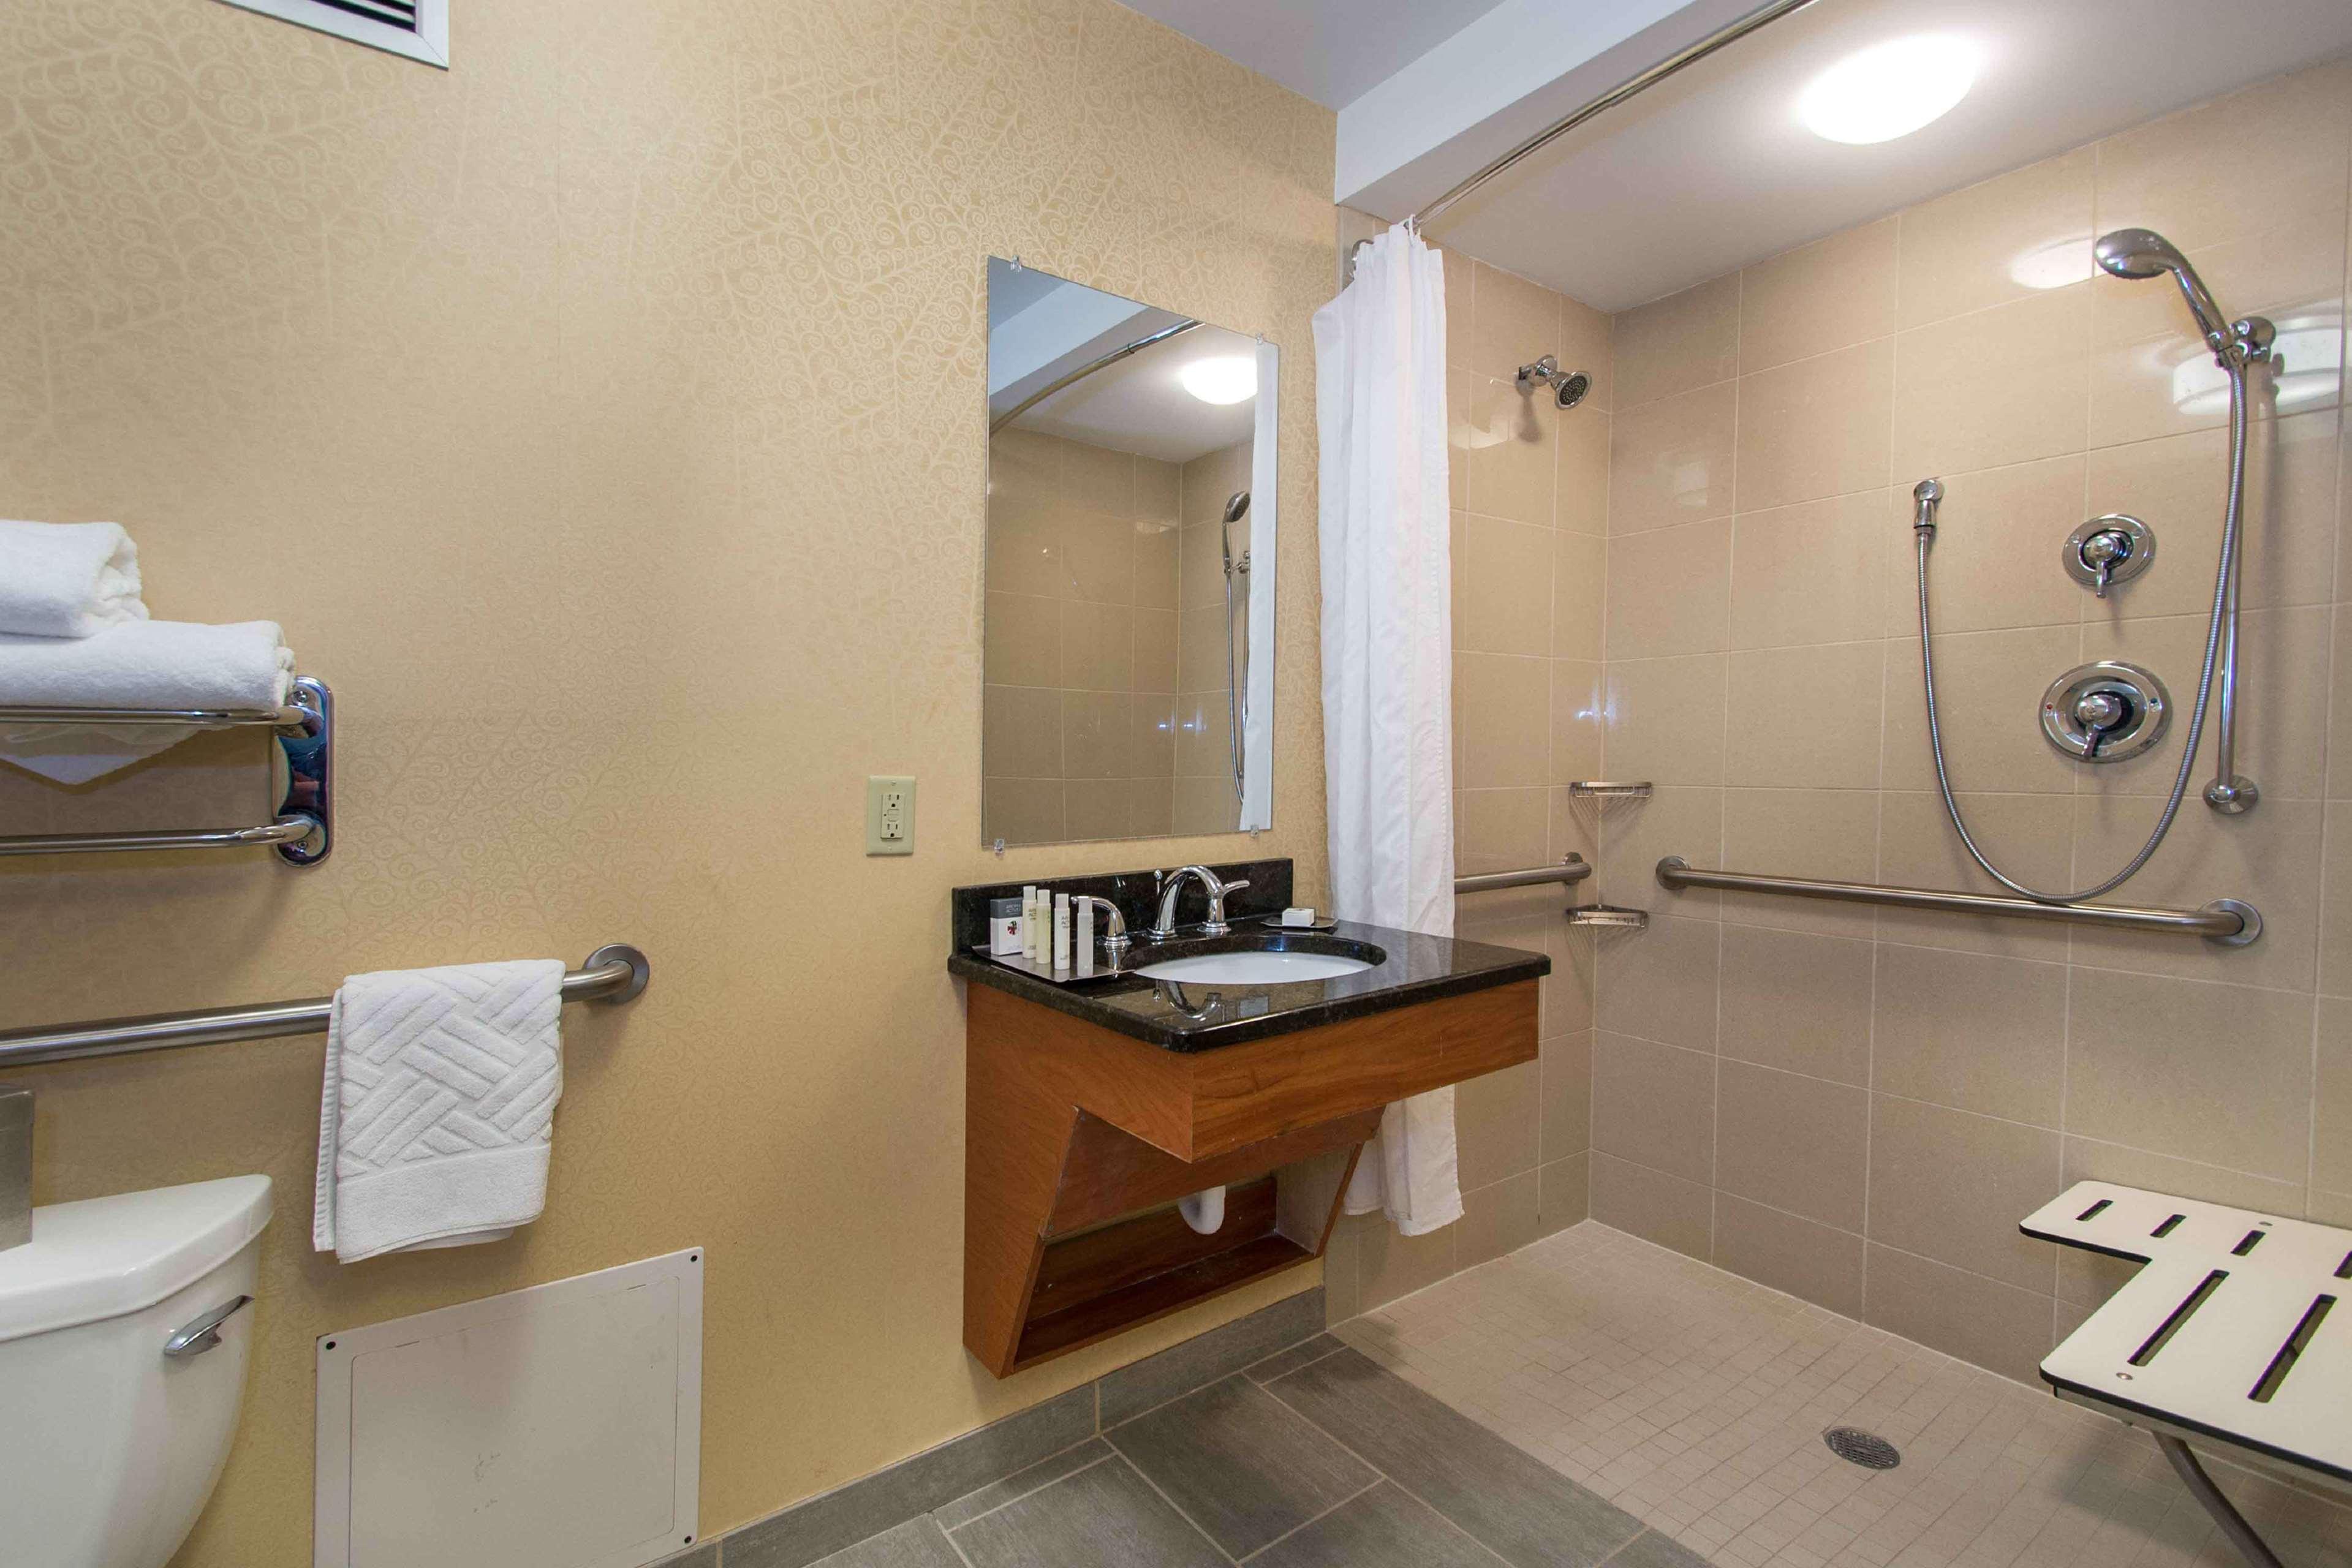 DoubleTree by Hilton Hotel Cleveland East Beachwood image 27